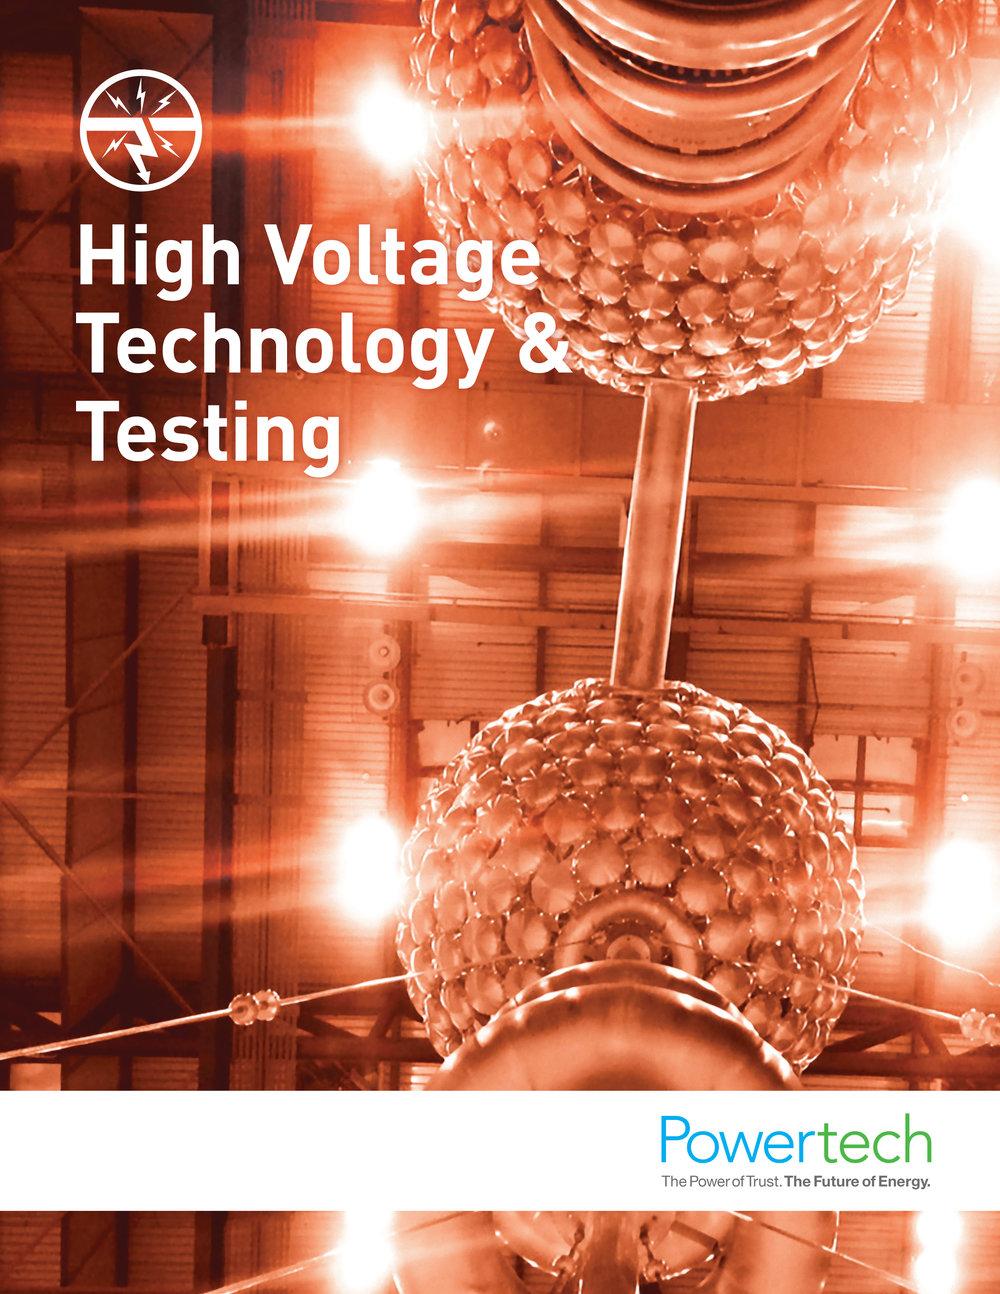 High Voltage high res rev-1.jpg